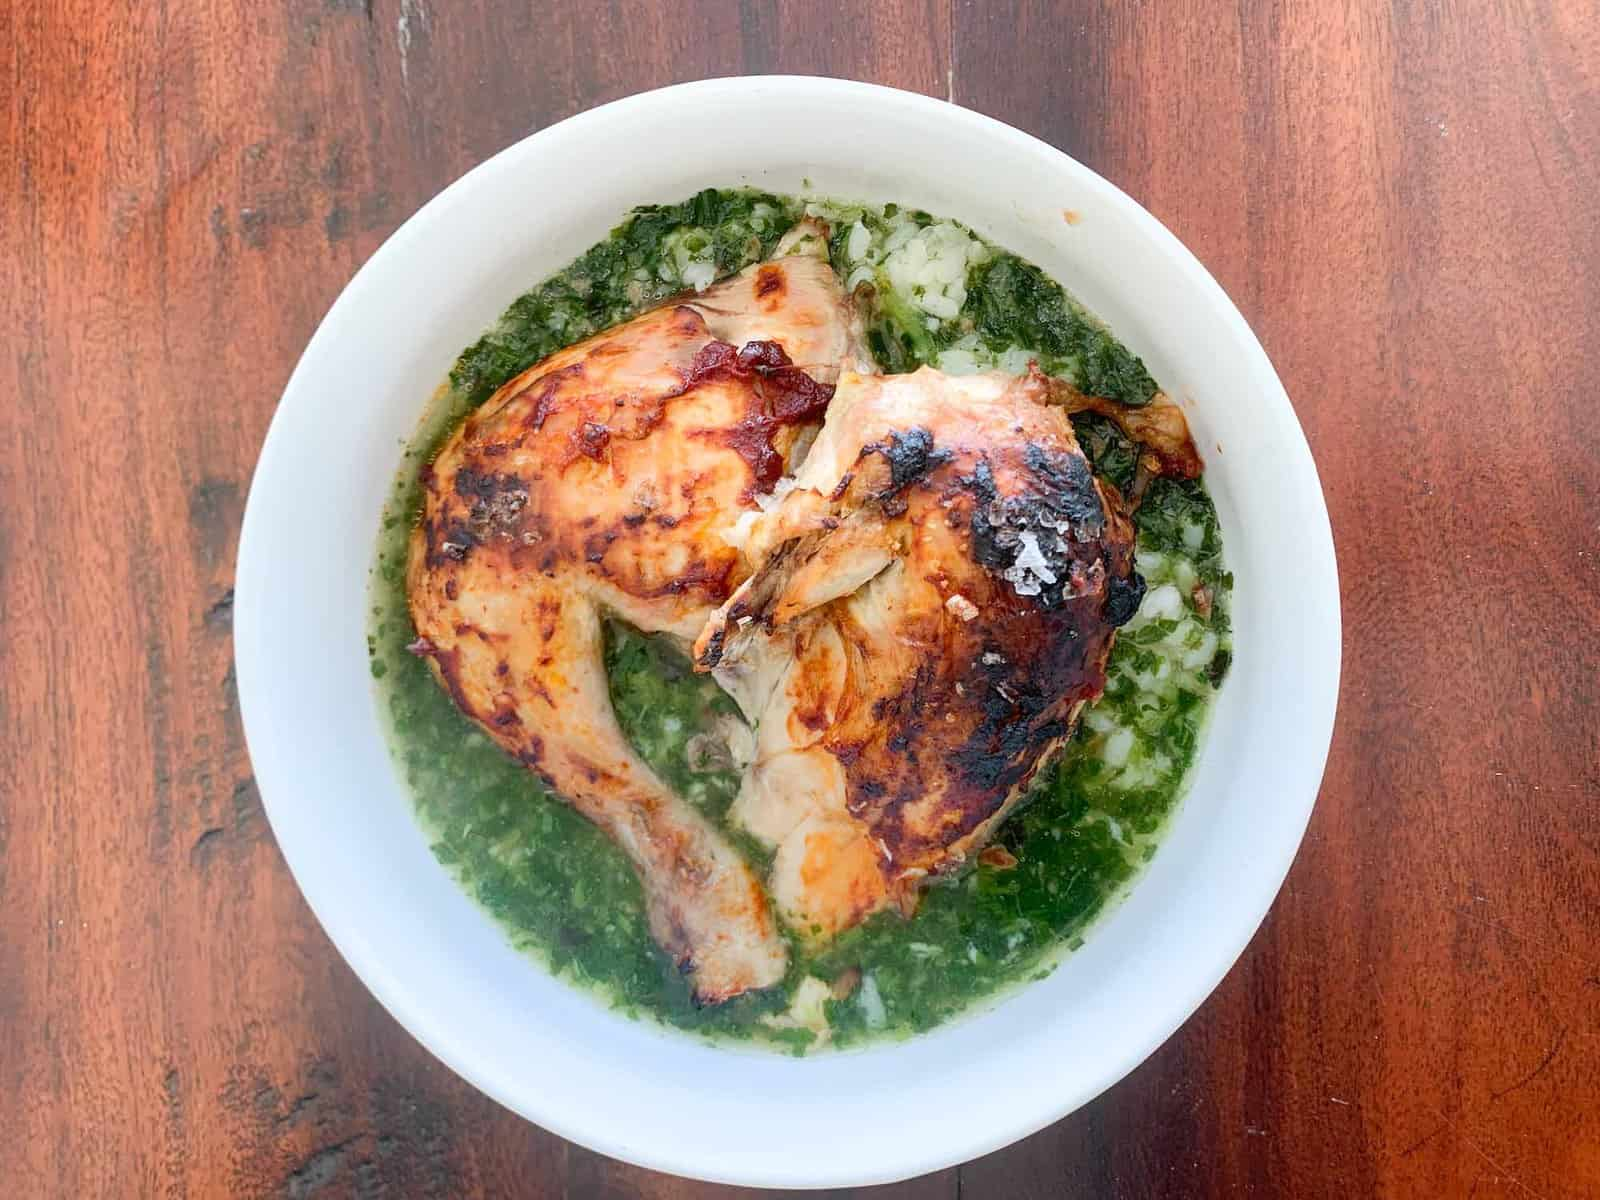 egyptian molokhia recipe with roasted chicken